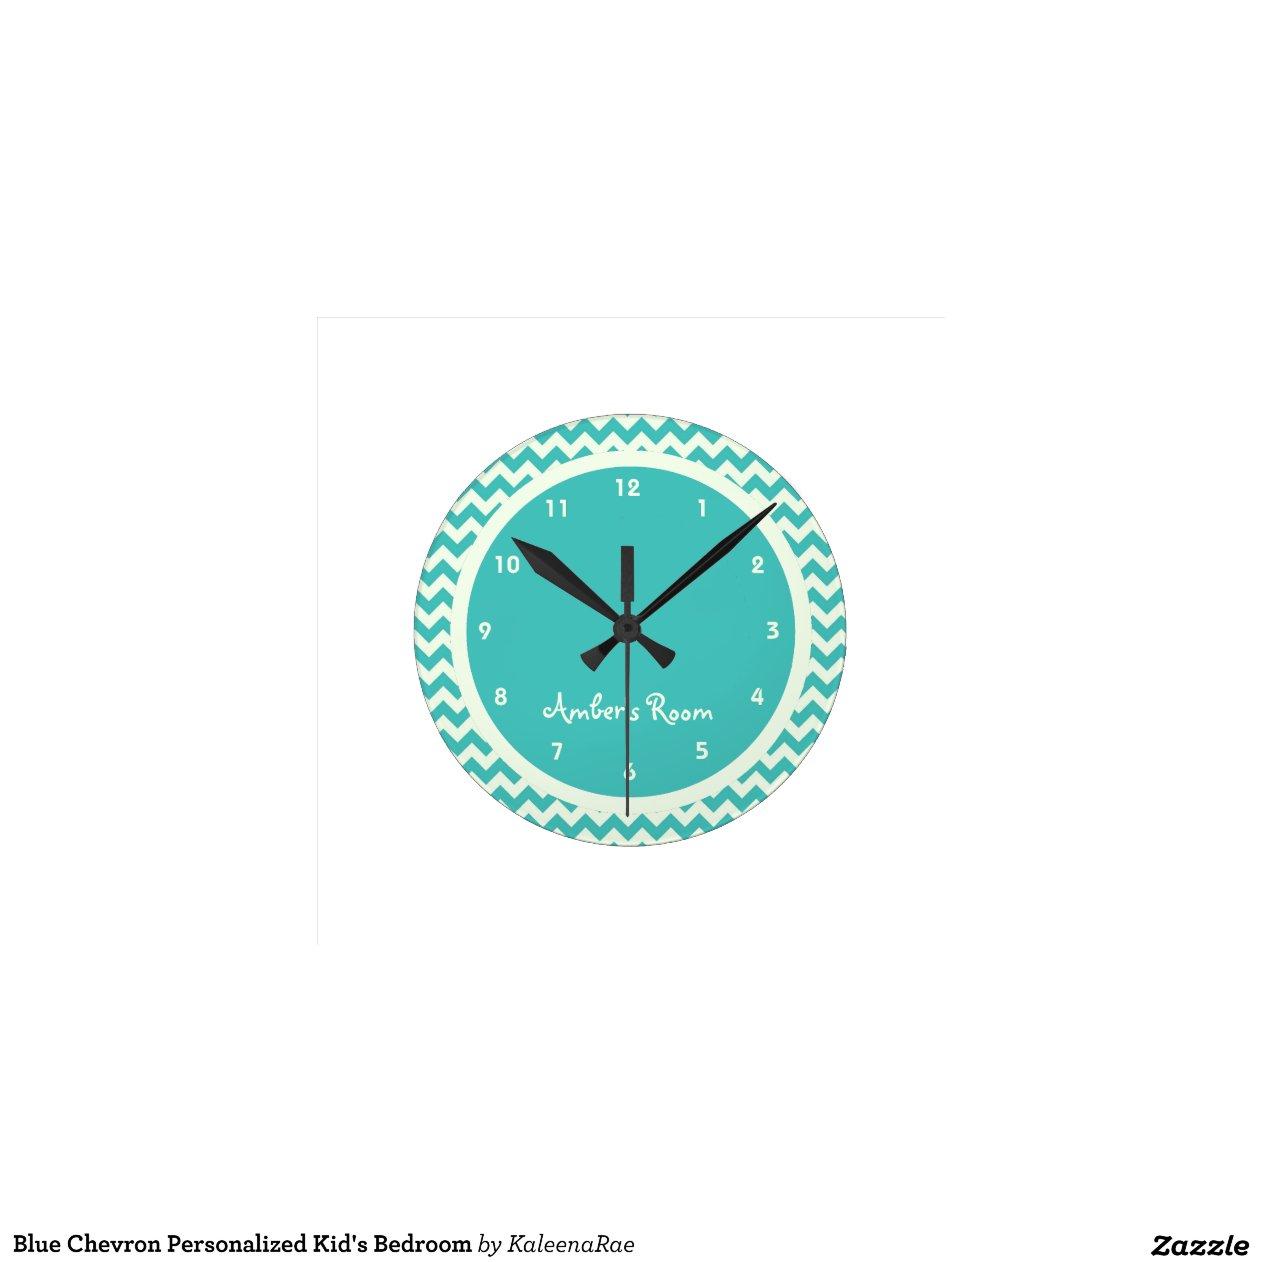 blue chevron personalised kid 39 s bedroom wall clock zazzle